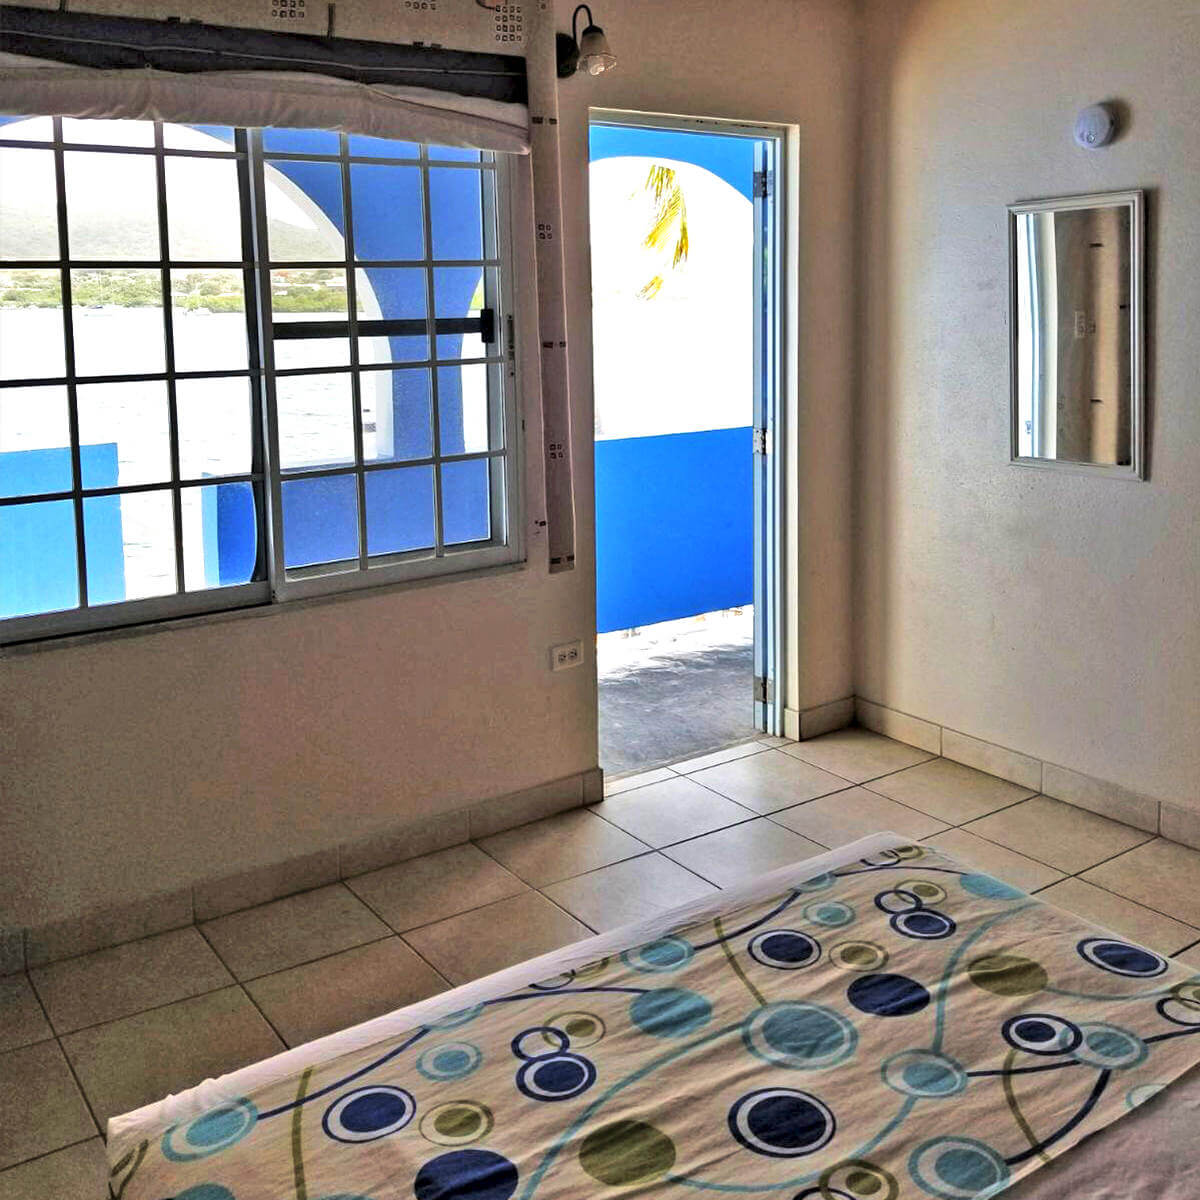 Villa Boheme Guest Room #9 - Doorway to private balcony.